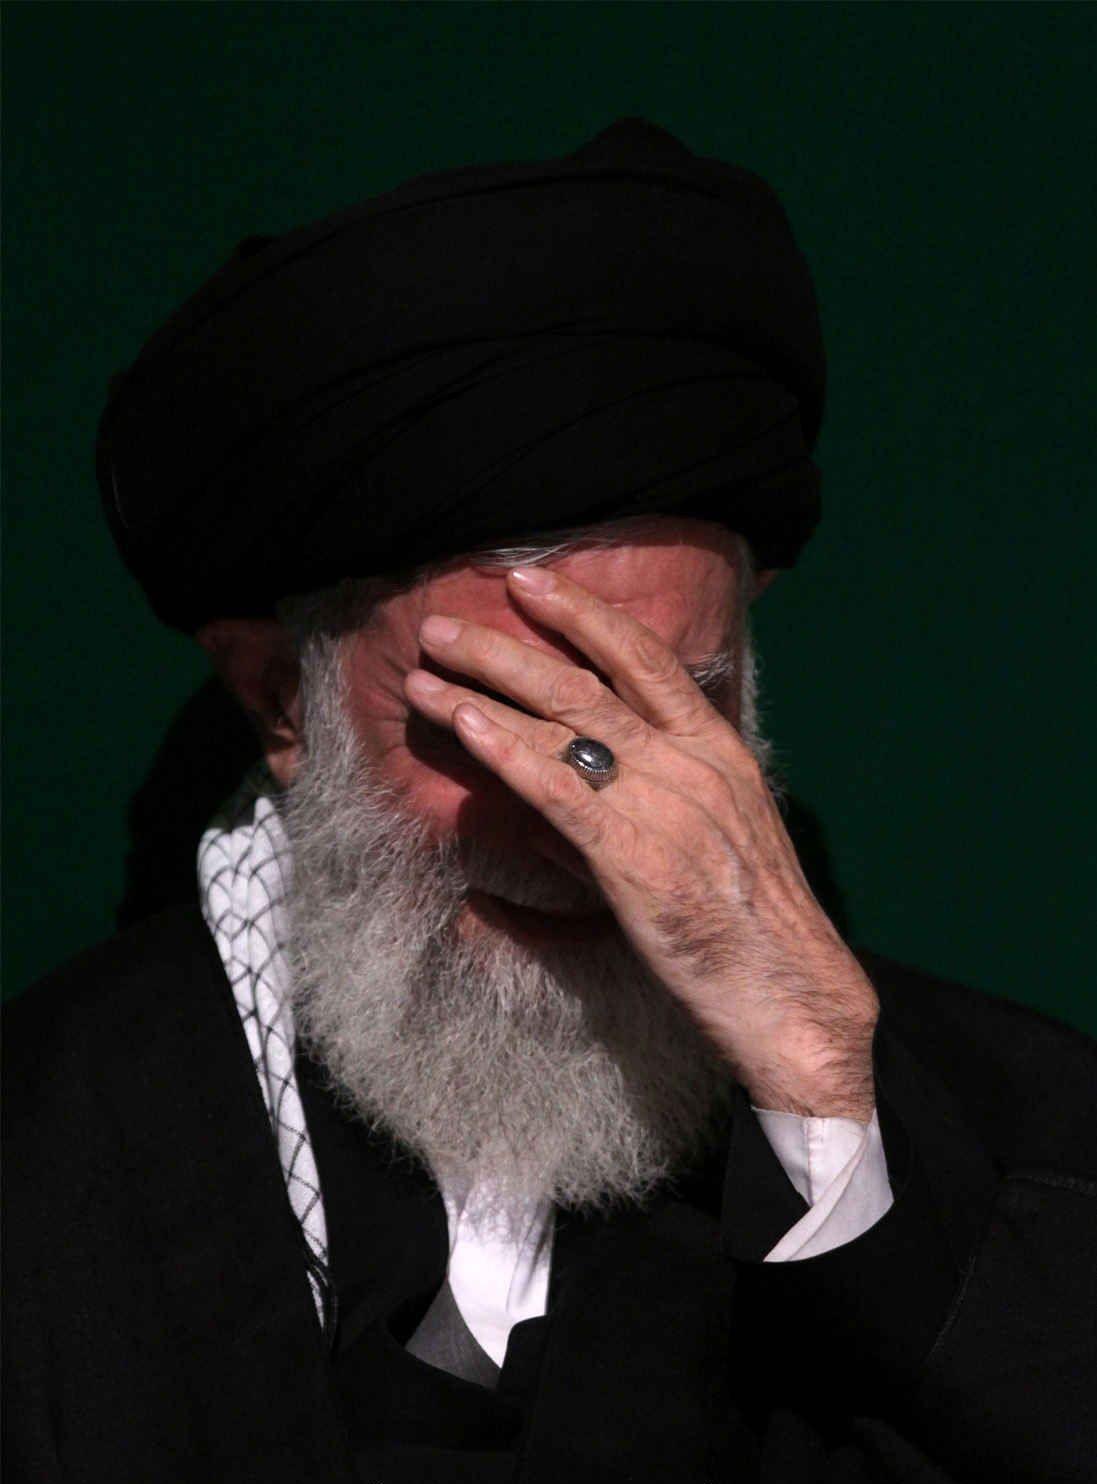 Ayatollah Khamenei Sayyed Ali Hosseini Khamenei Is The Second And